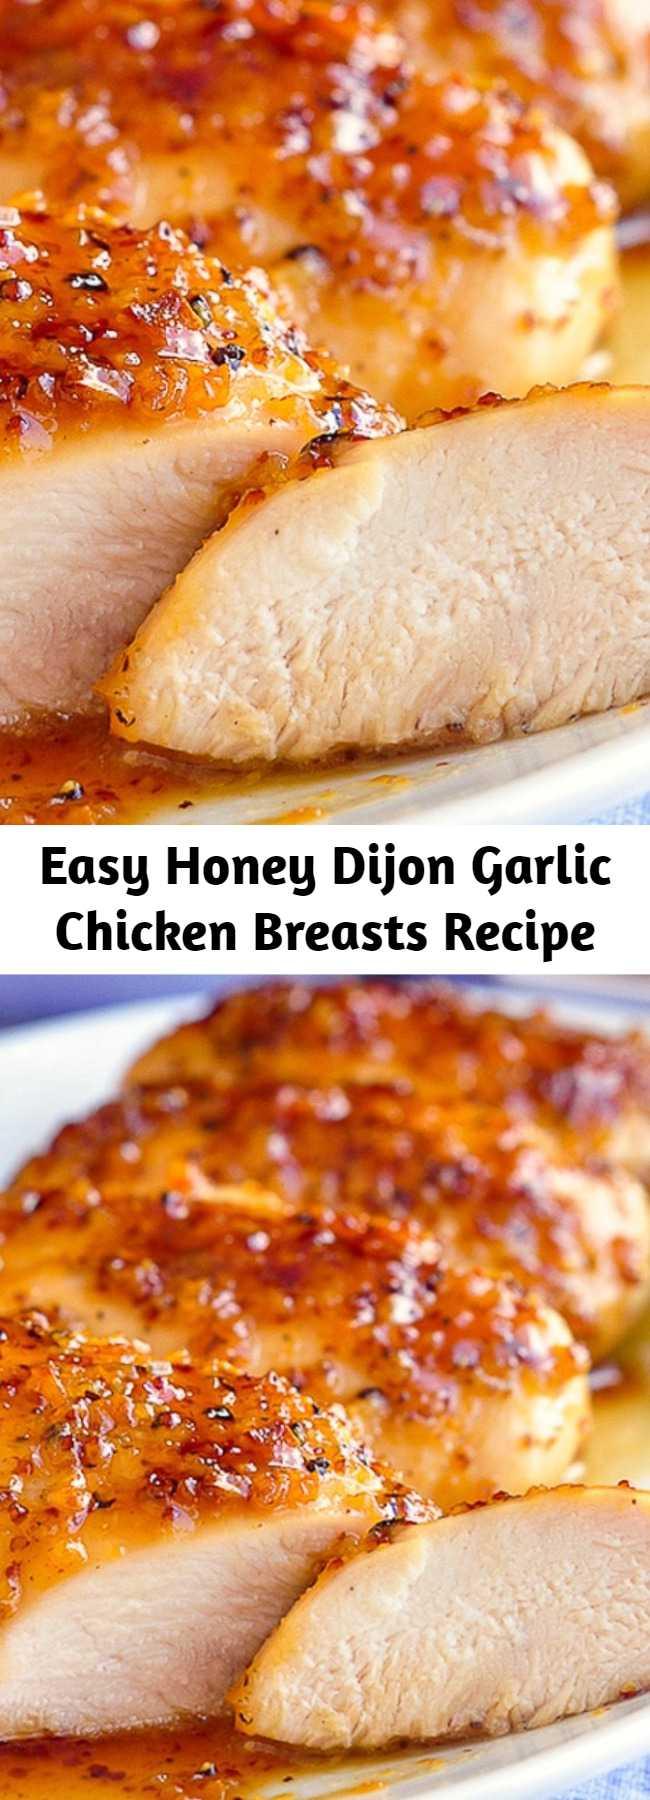 Easy Honey Dijon Garlic Chicken Breasts Recipe - Boneless skinless chicken Breasts quickly baked in an intensely flavoured honey, garlic and Dijon mustard glaze.